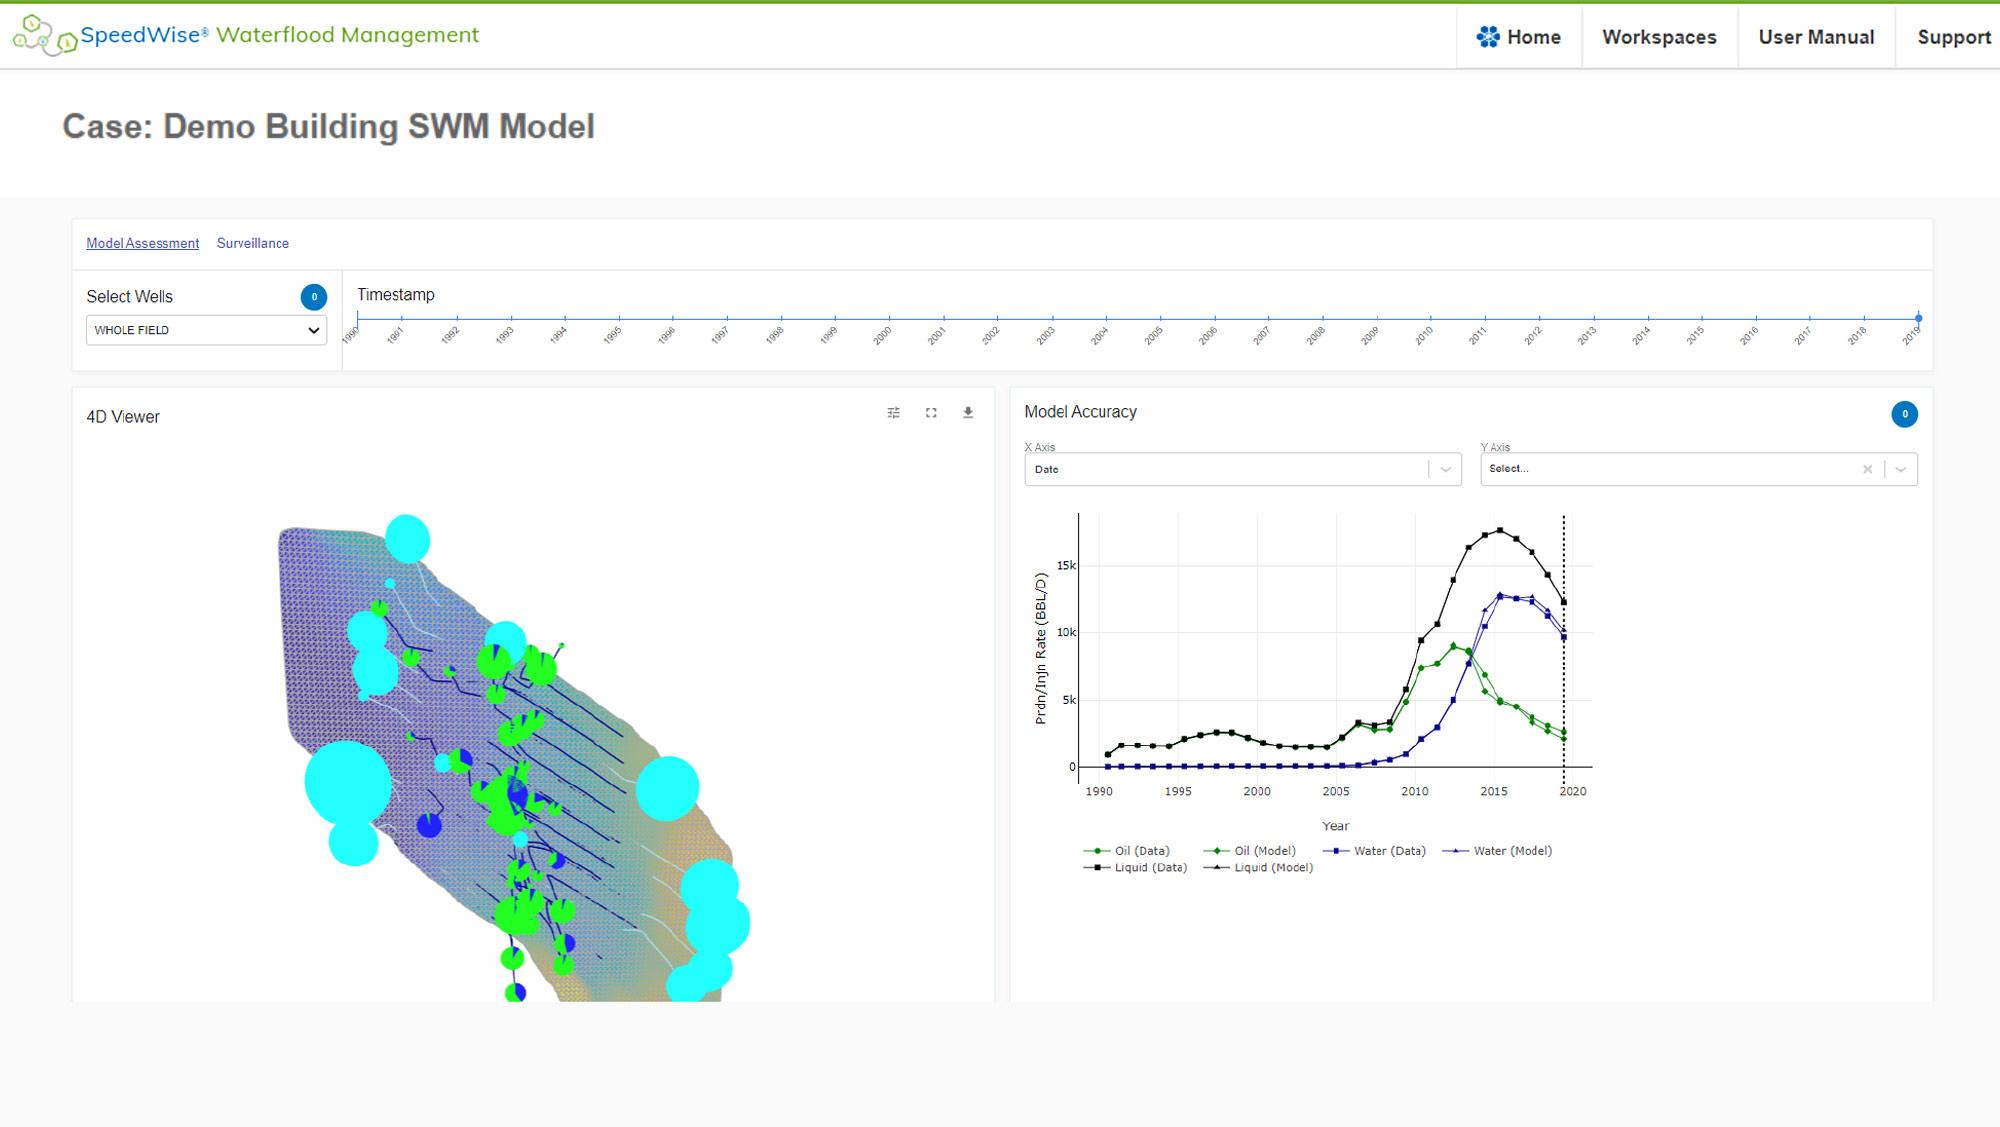 SWM - Waterflood Optimization using Data-Driven Models